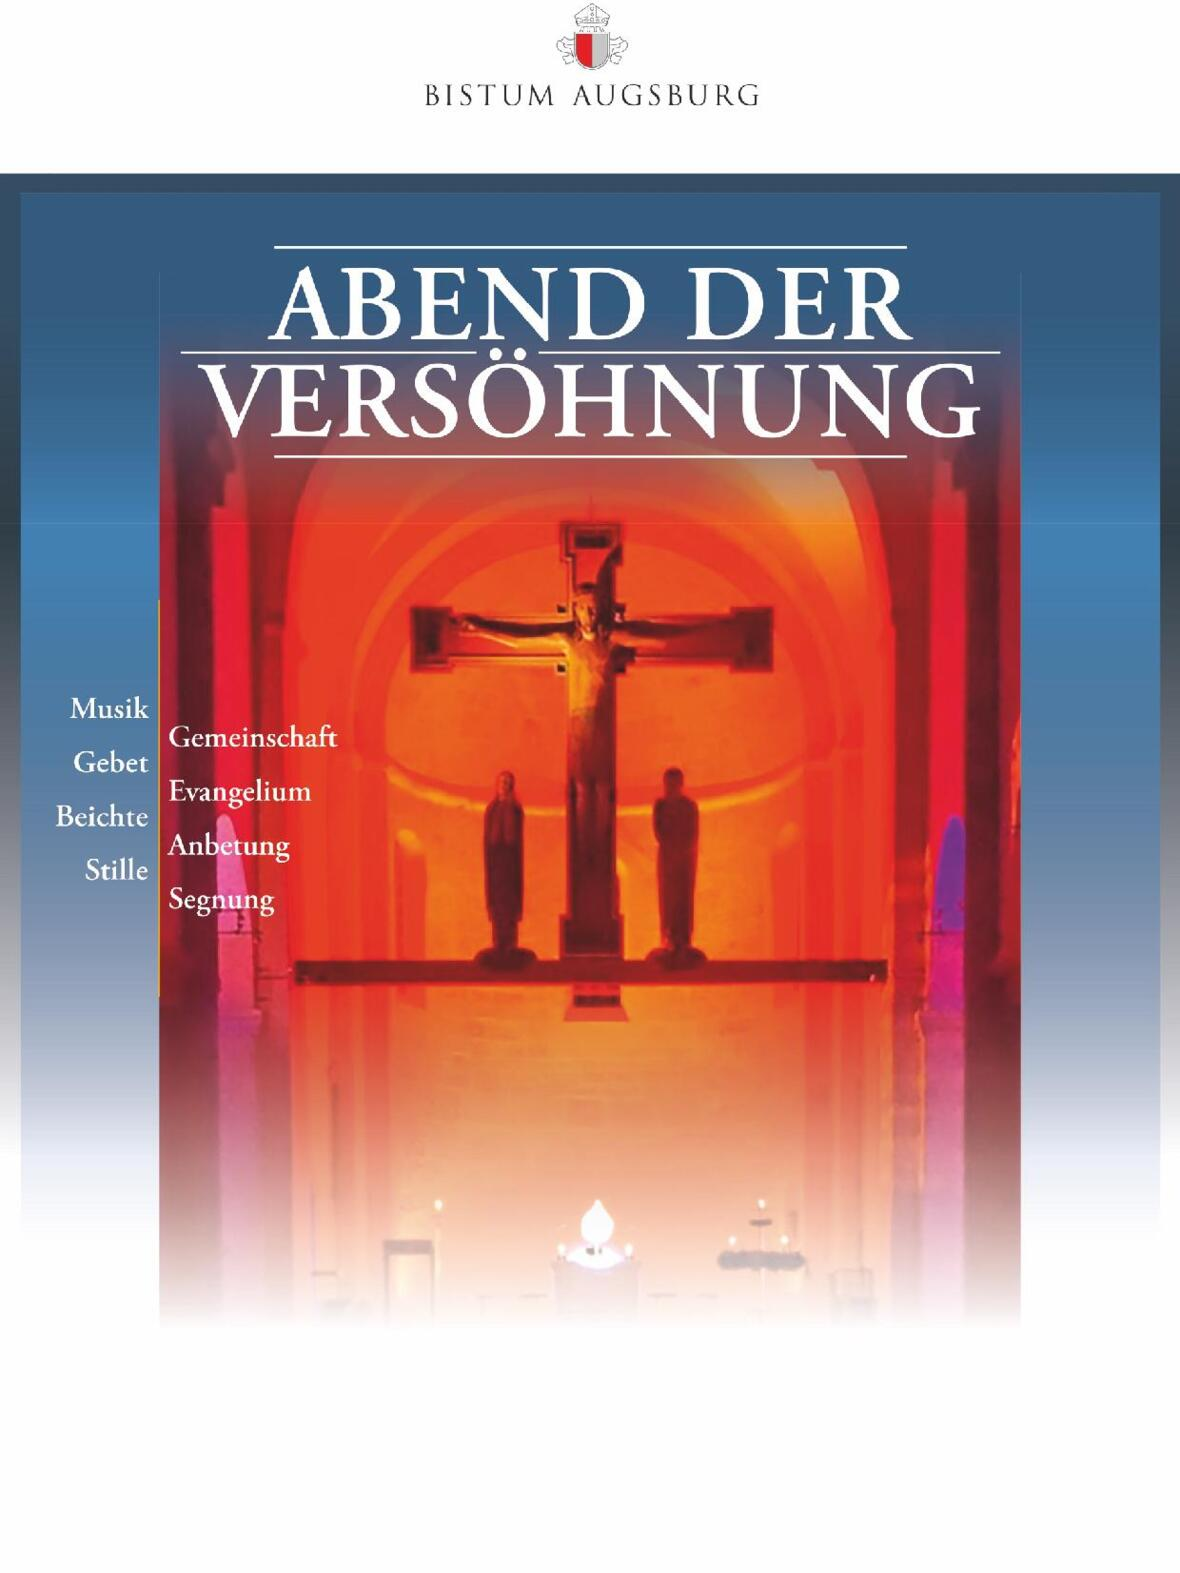 Foto: Rainer Siegl; Plakat: St. Ulrichsverlag